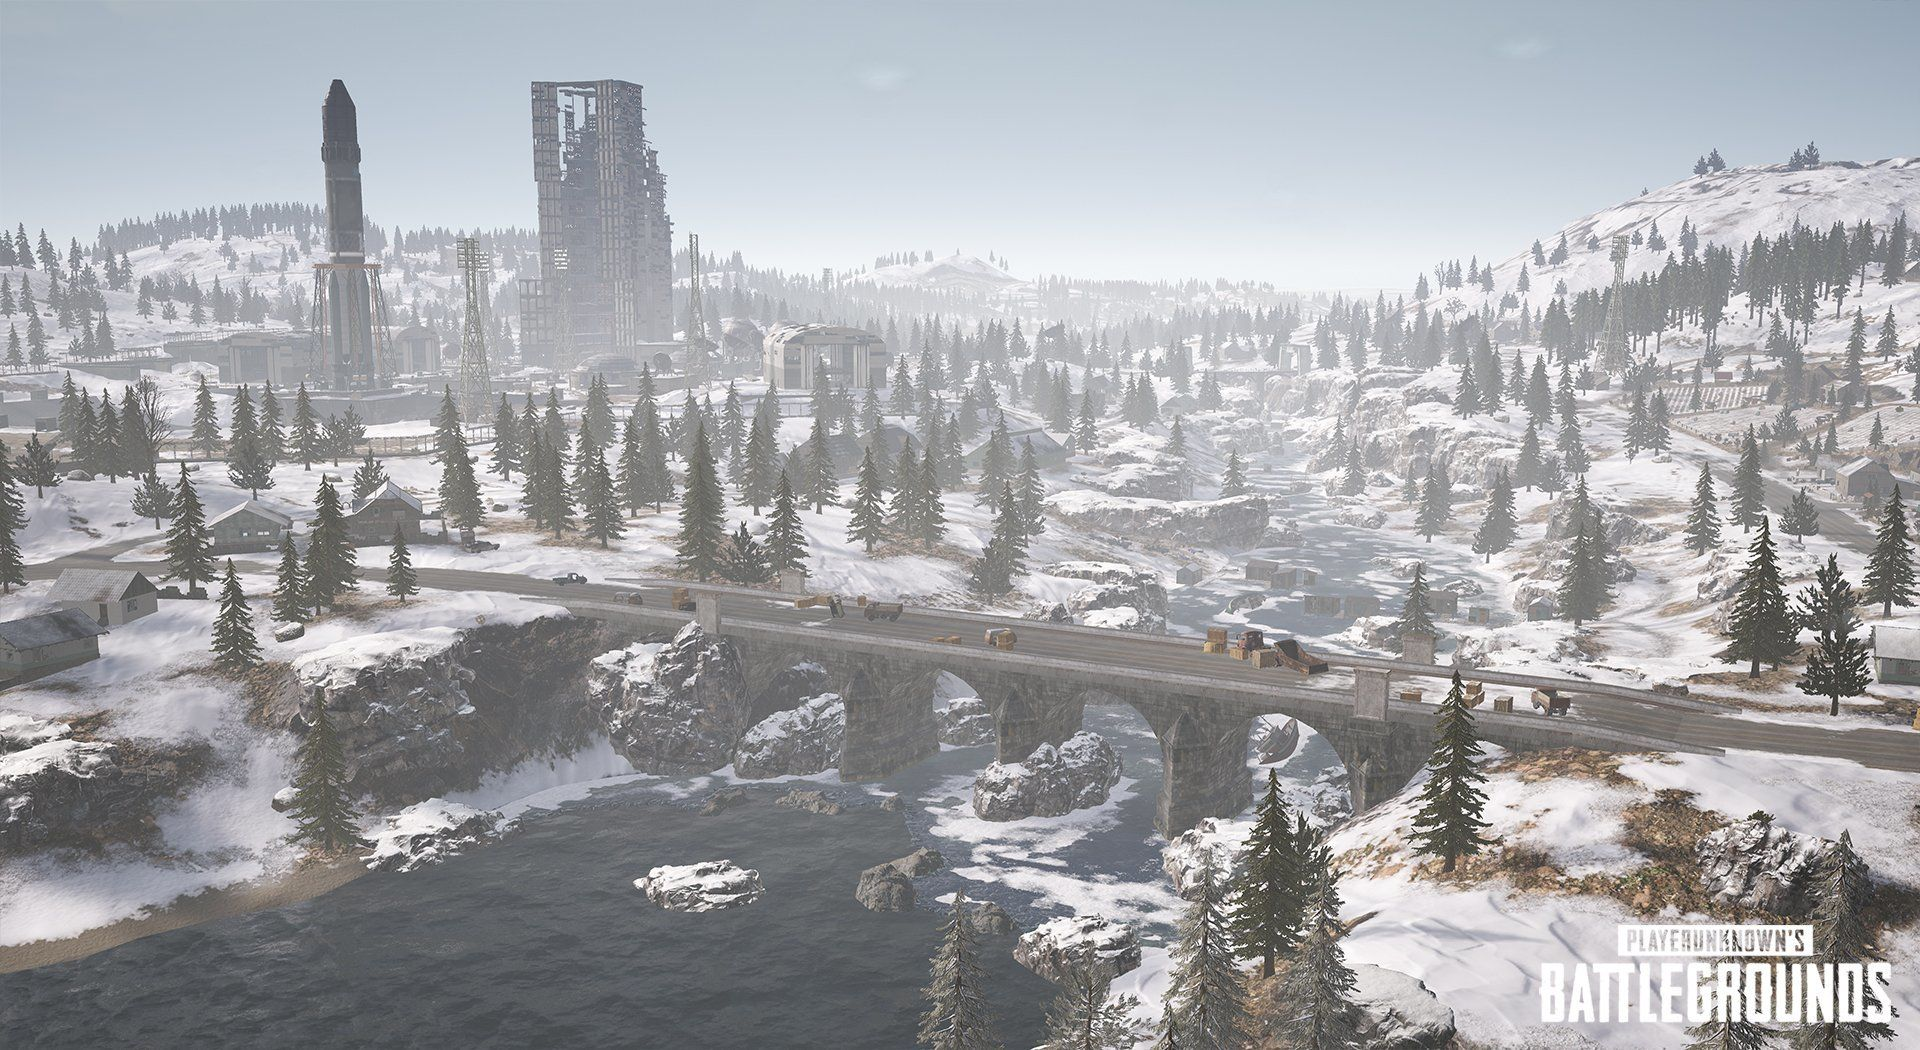 Pubg Snow Wallpaper Hd: 'PUBG' Update 24 Adds Vikendi Snow Map, Snowmobile & G36C